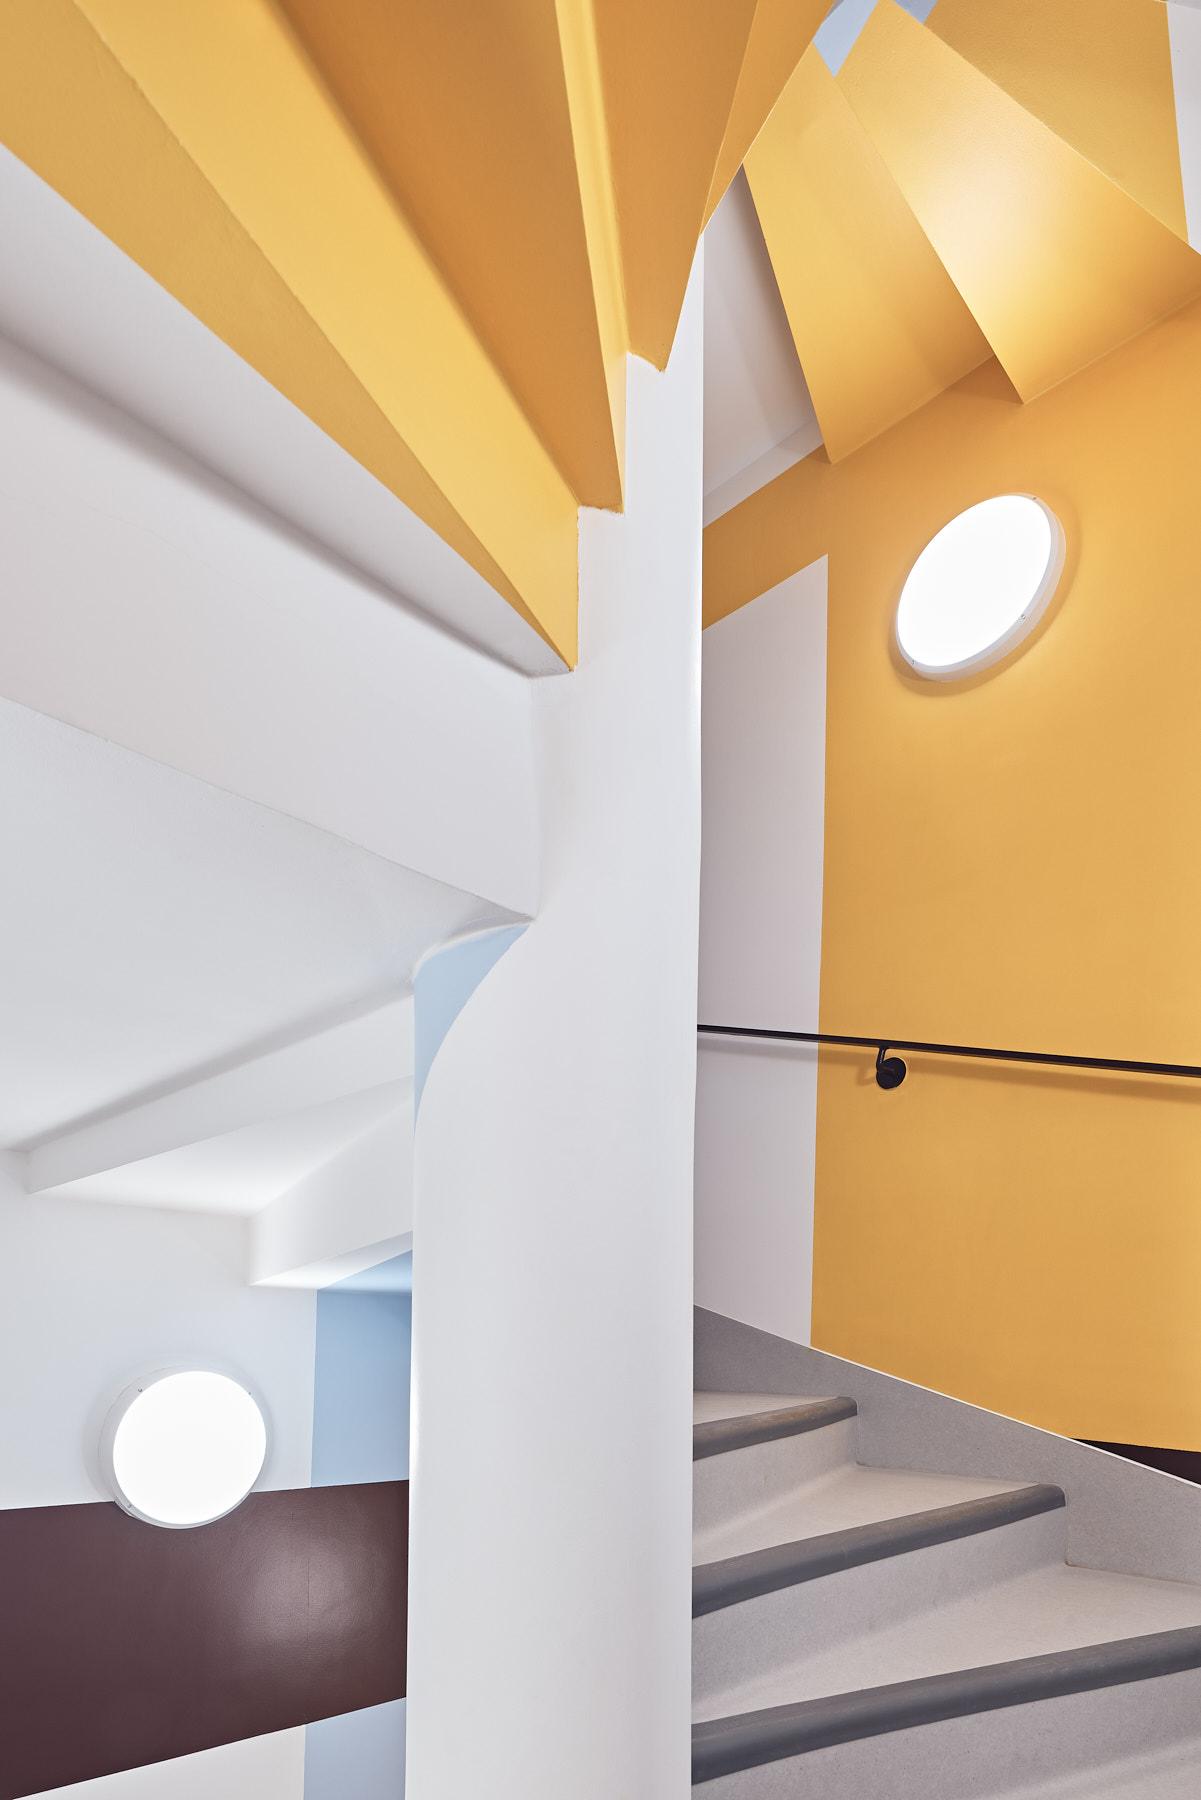 Philippe Balc'h architectes